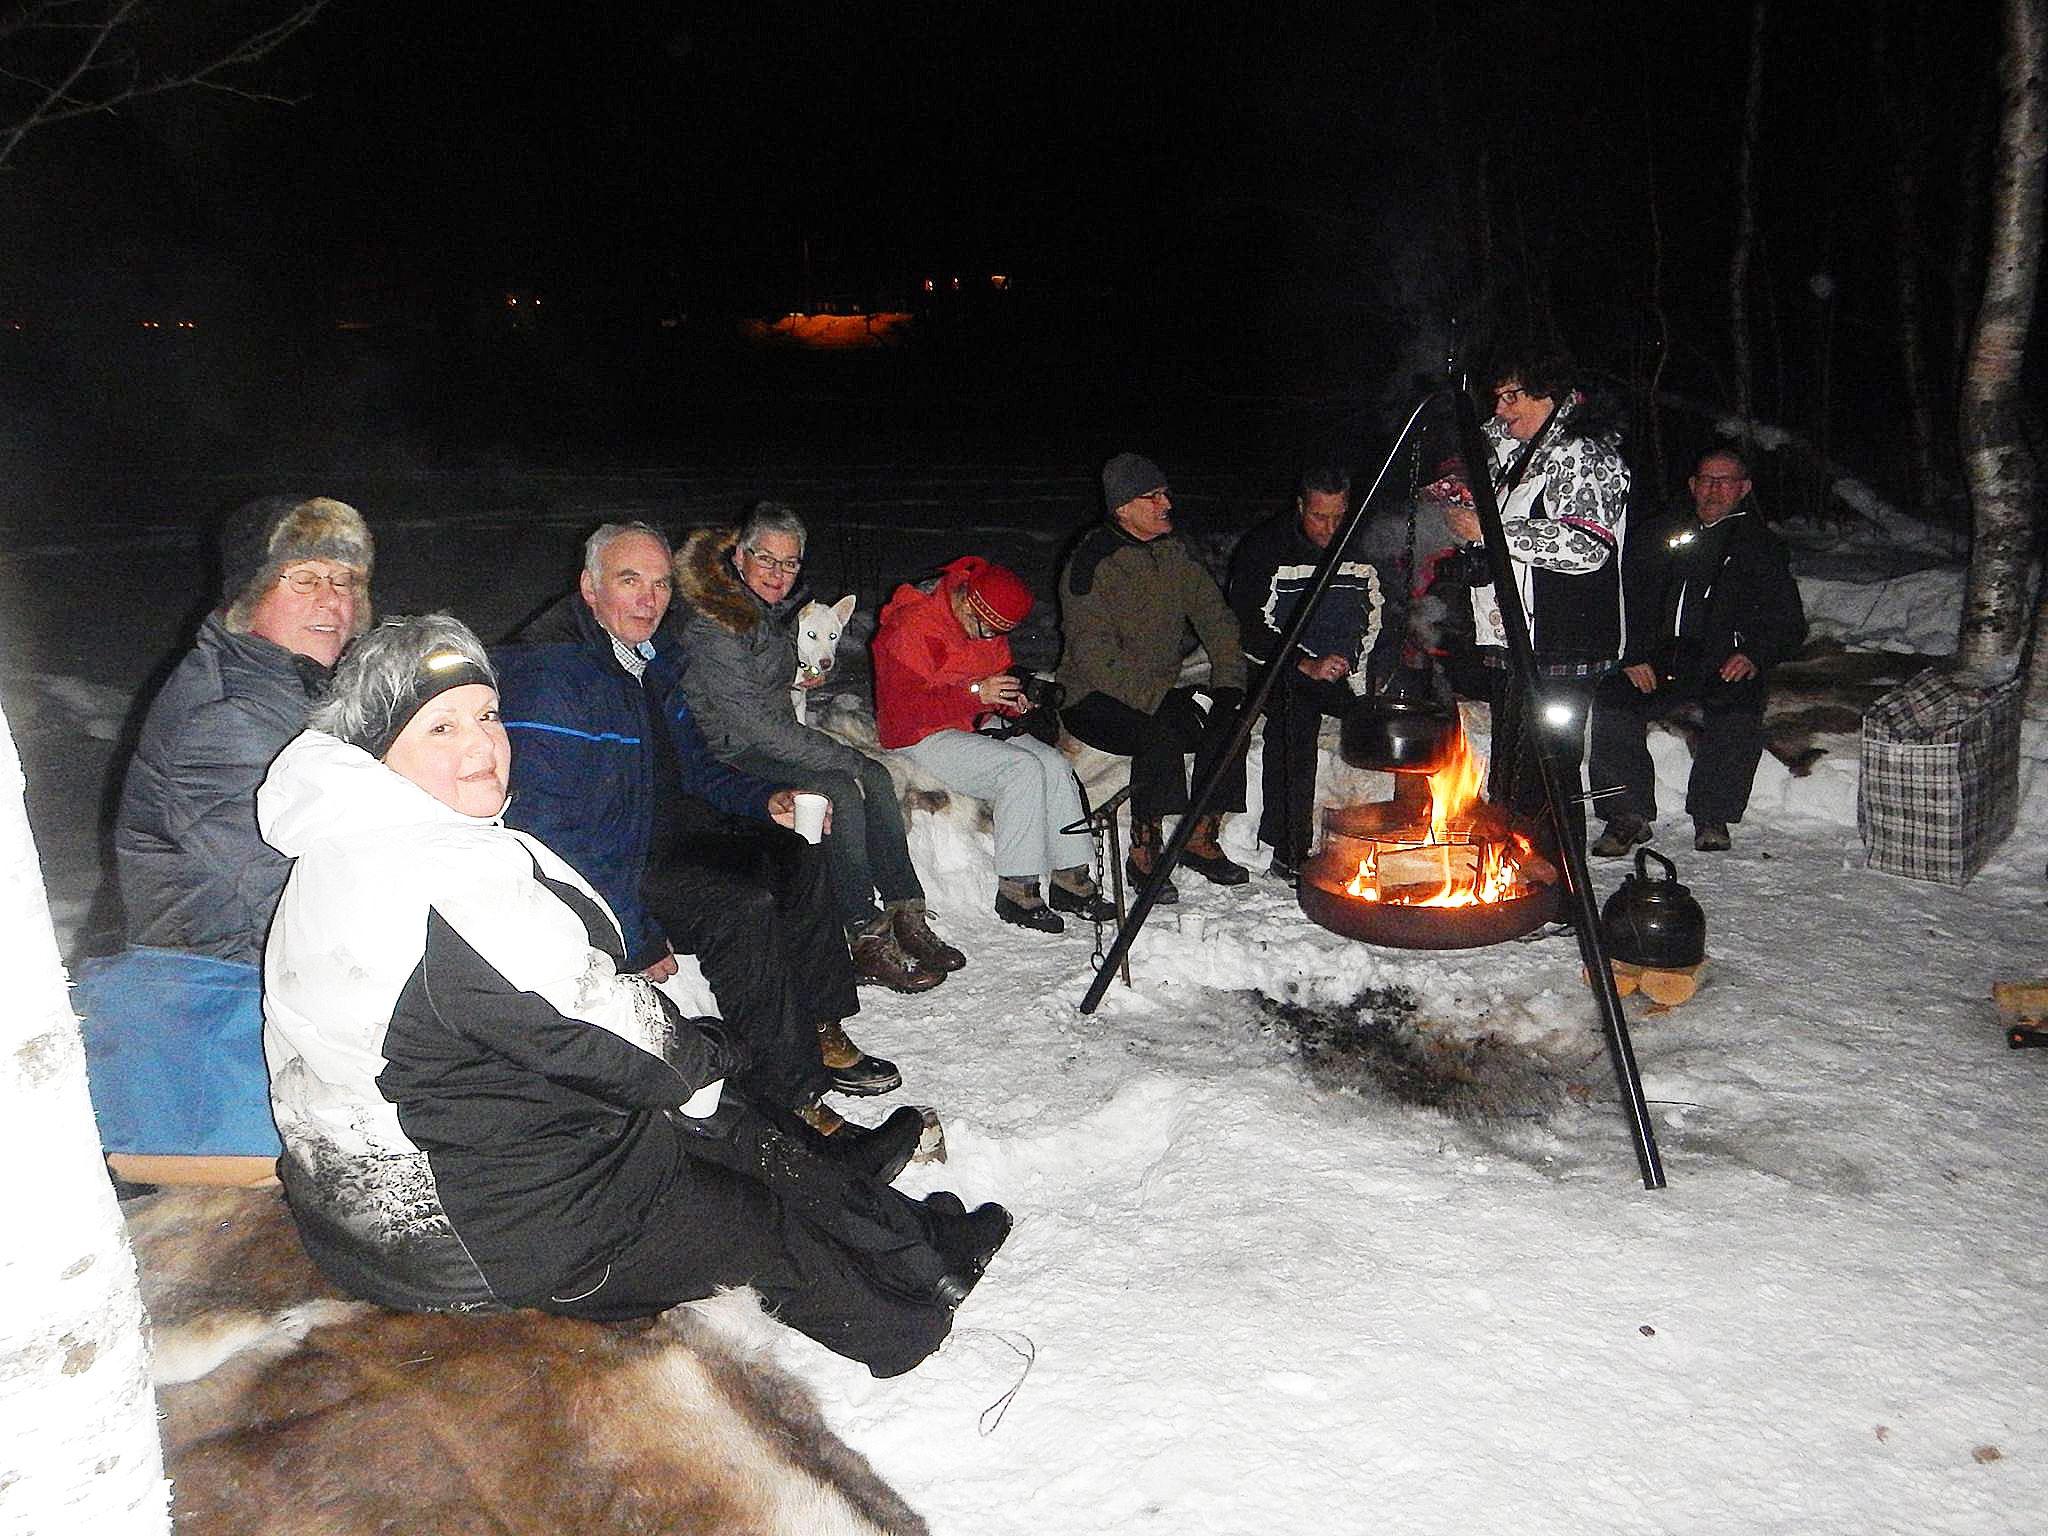 Snowman - Trugetur med guide - Destination Snowman